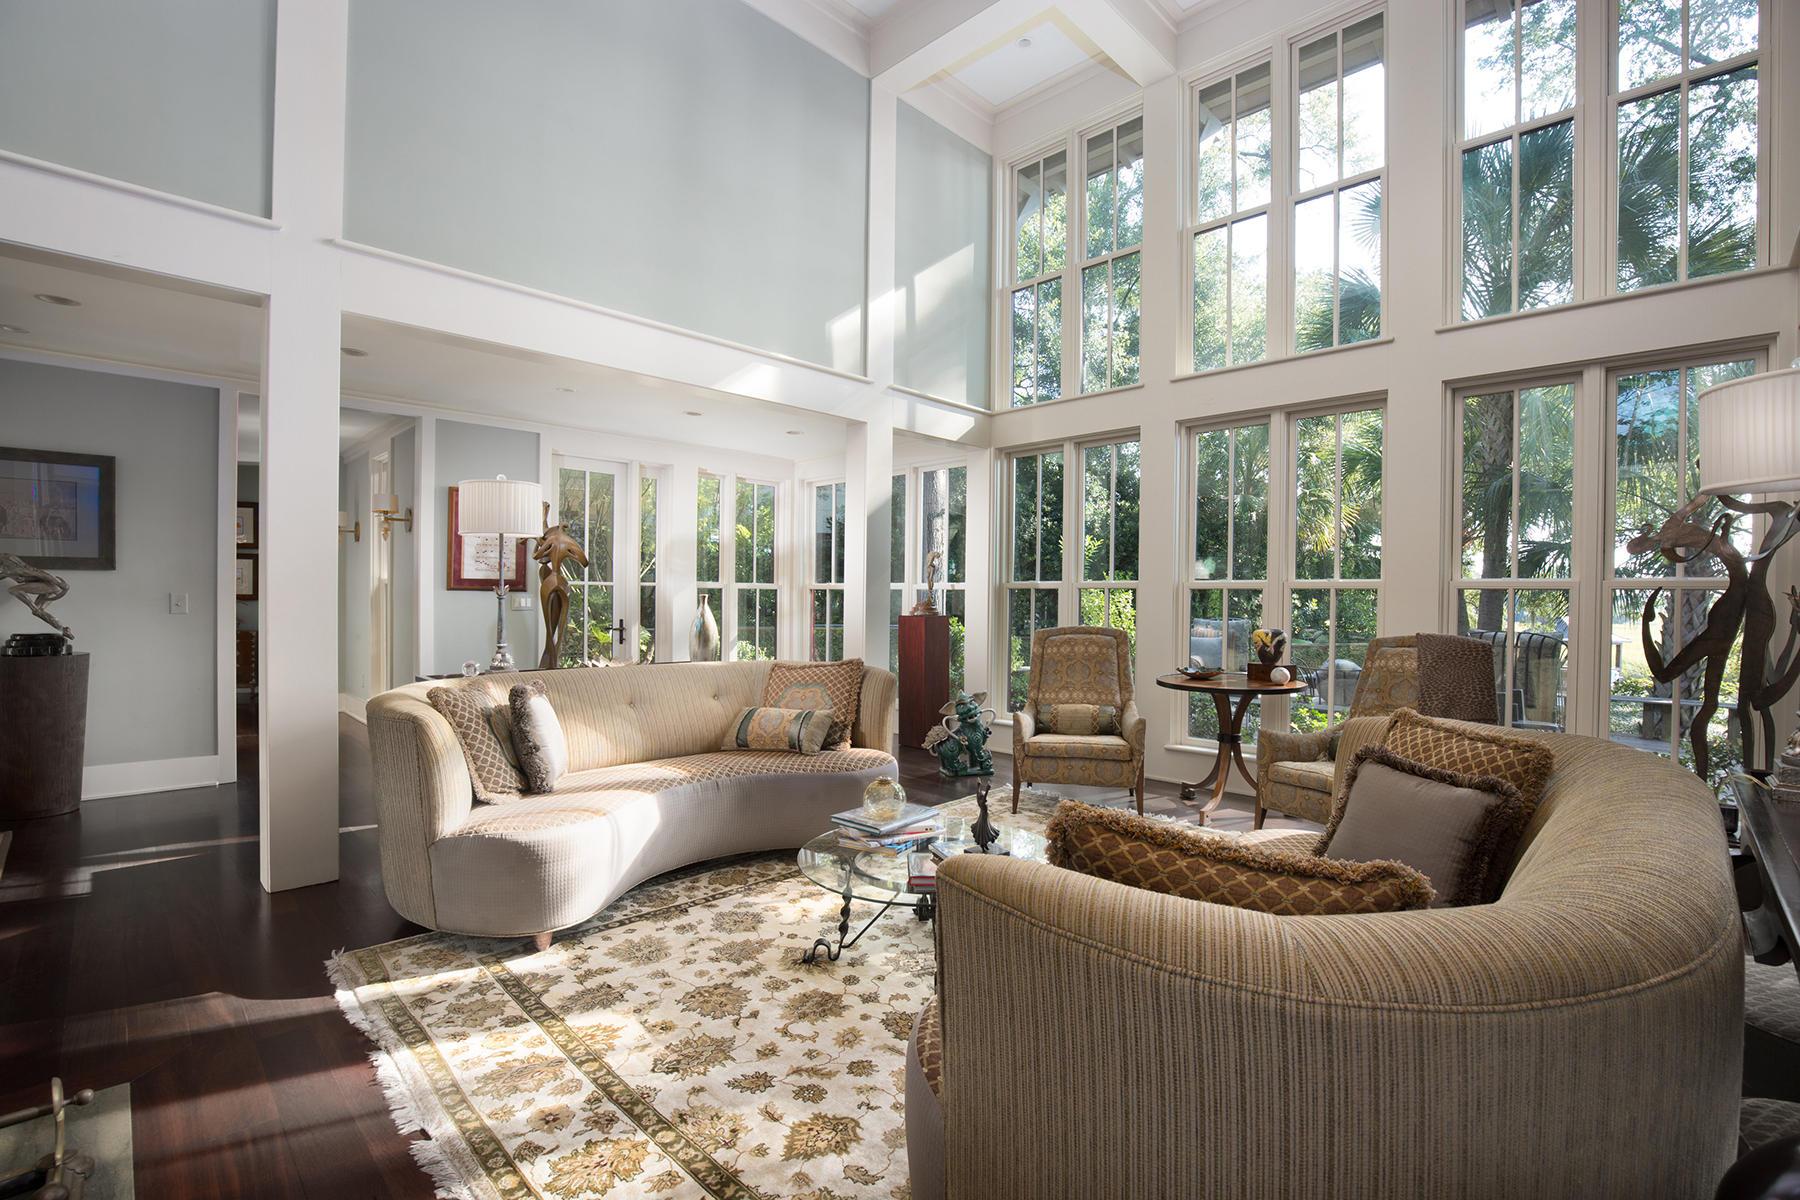 Ellis Oaks Homes For Sale - 672 Ellis Oak, Charleston, SC - 13